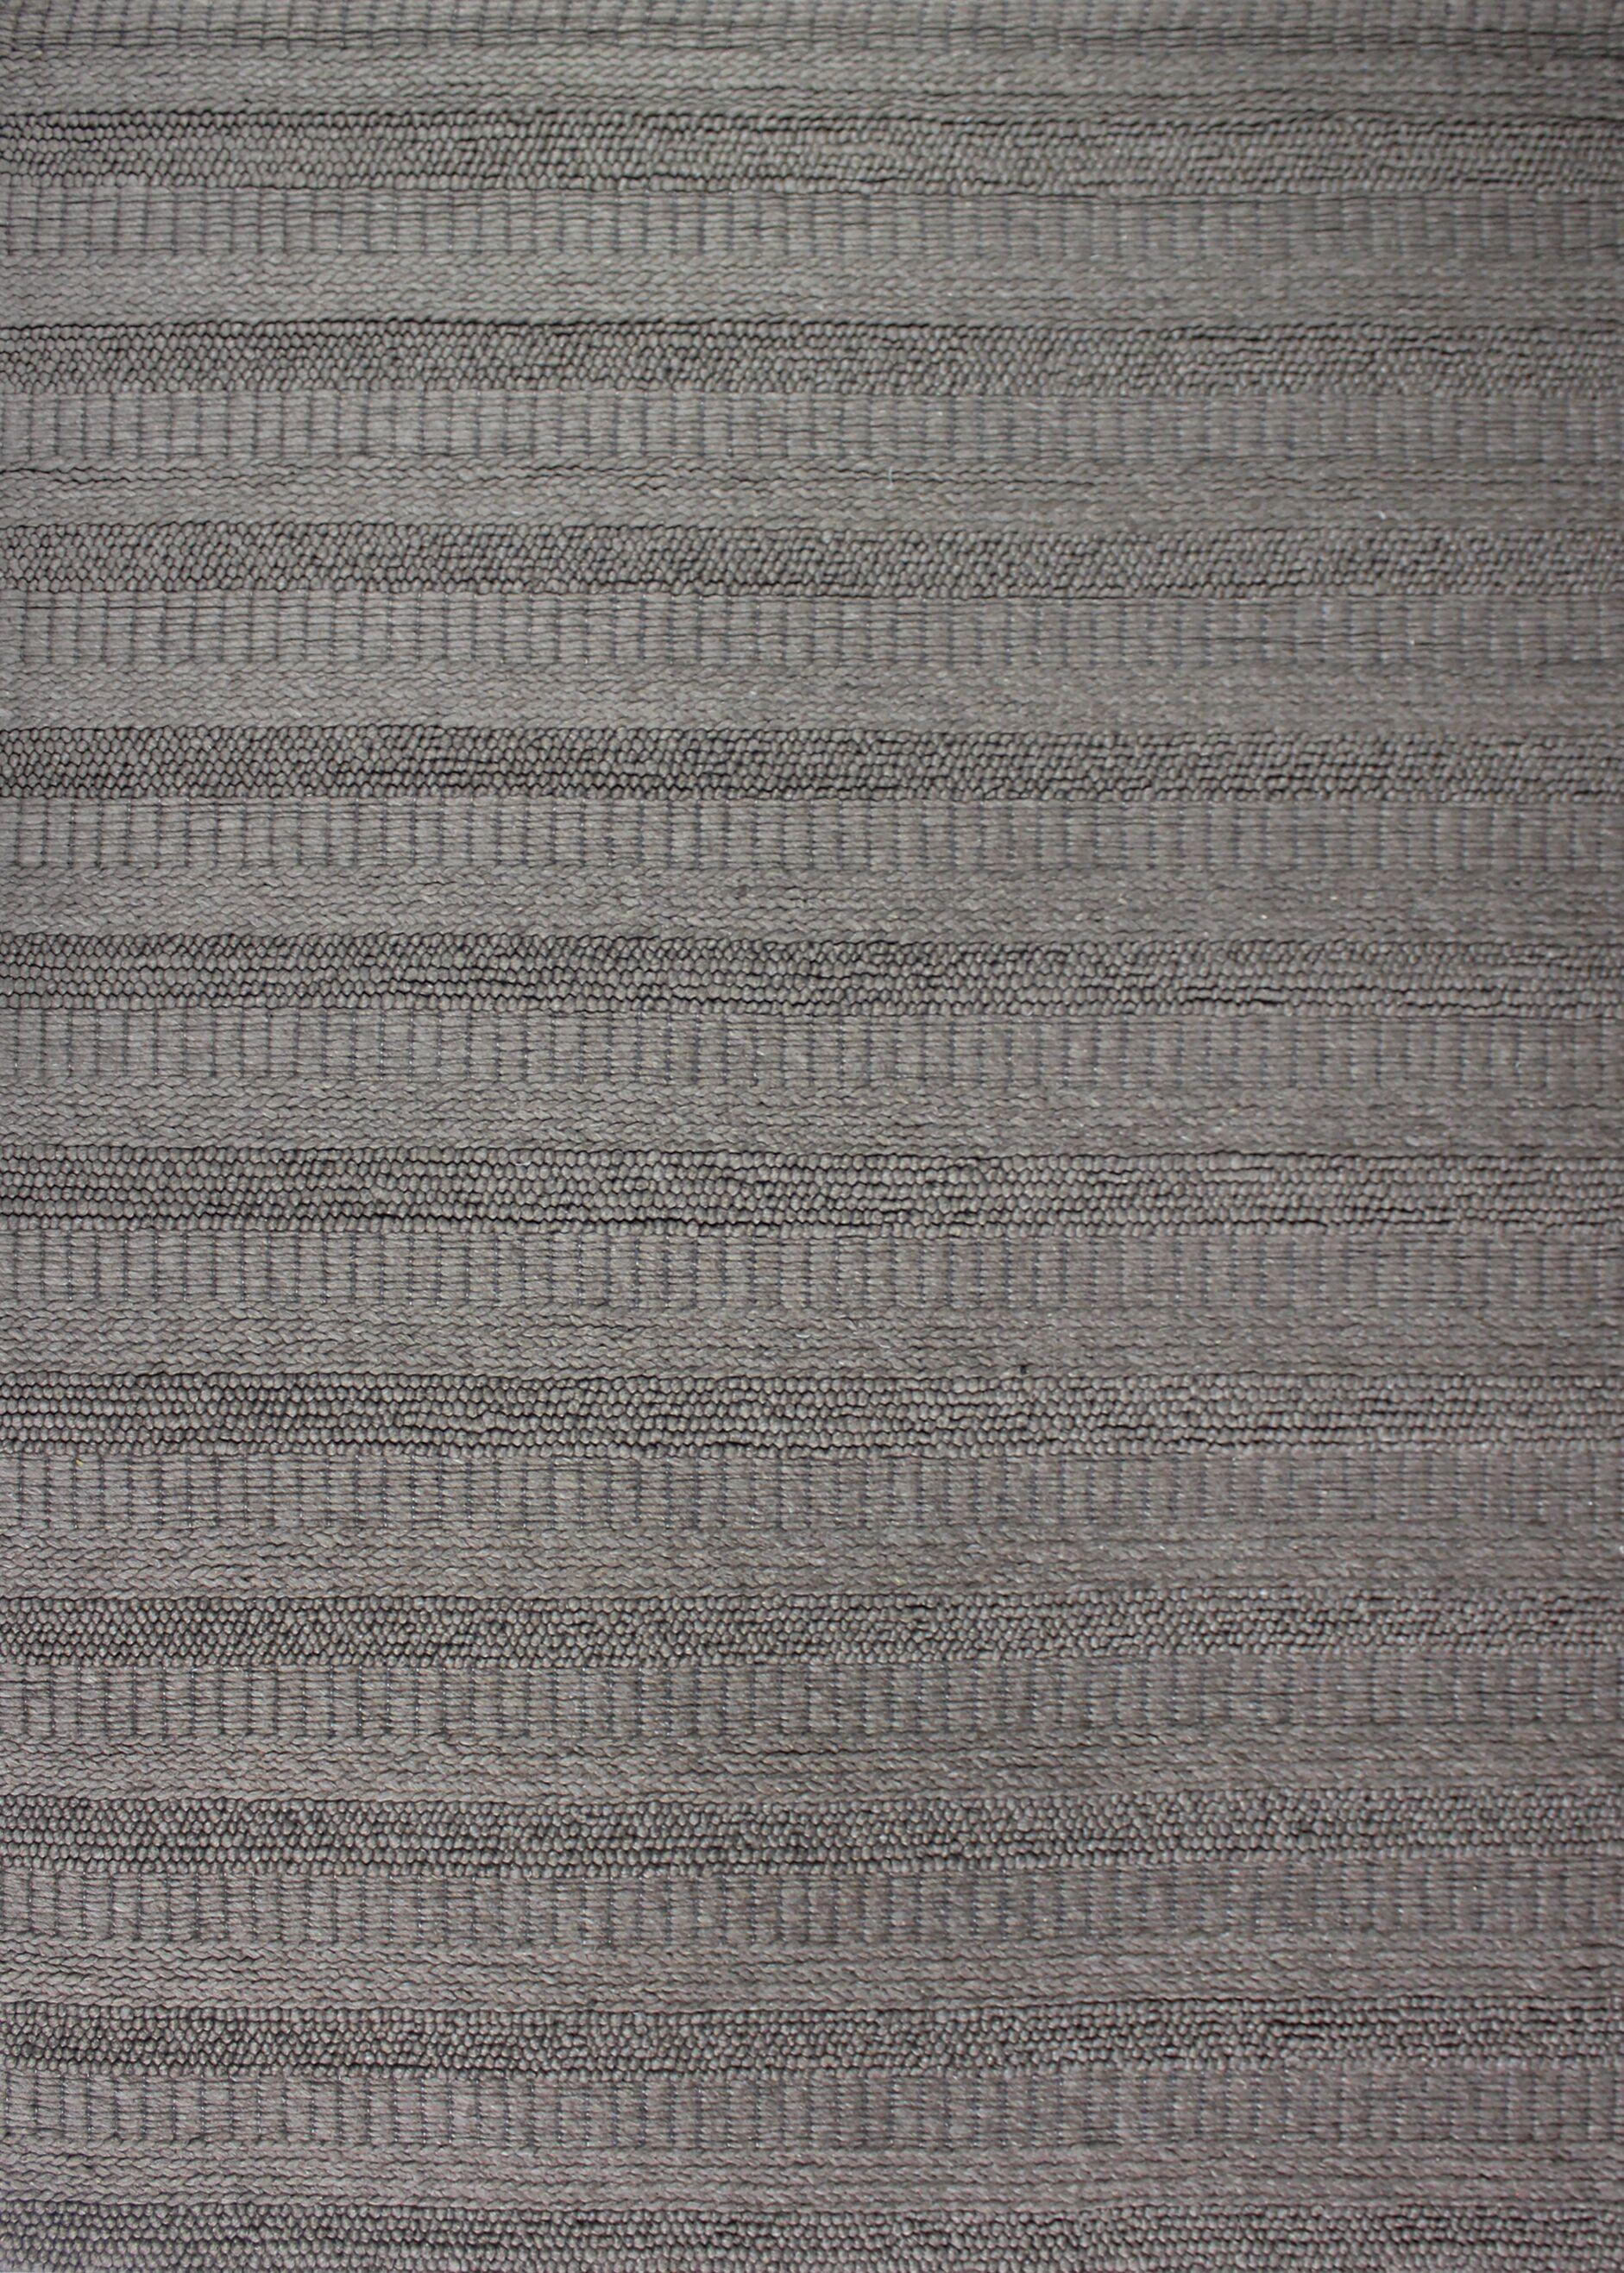 Moorer Brown Rug Rug Size: Rectangle 5' x 8'